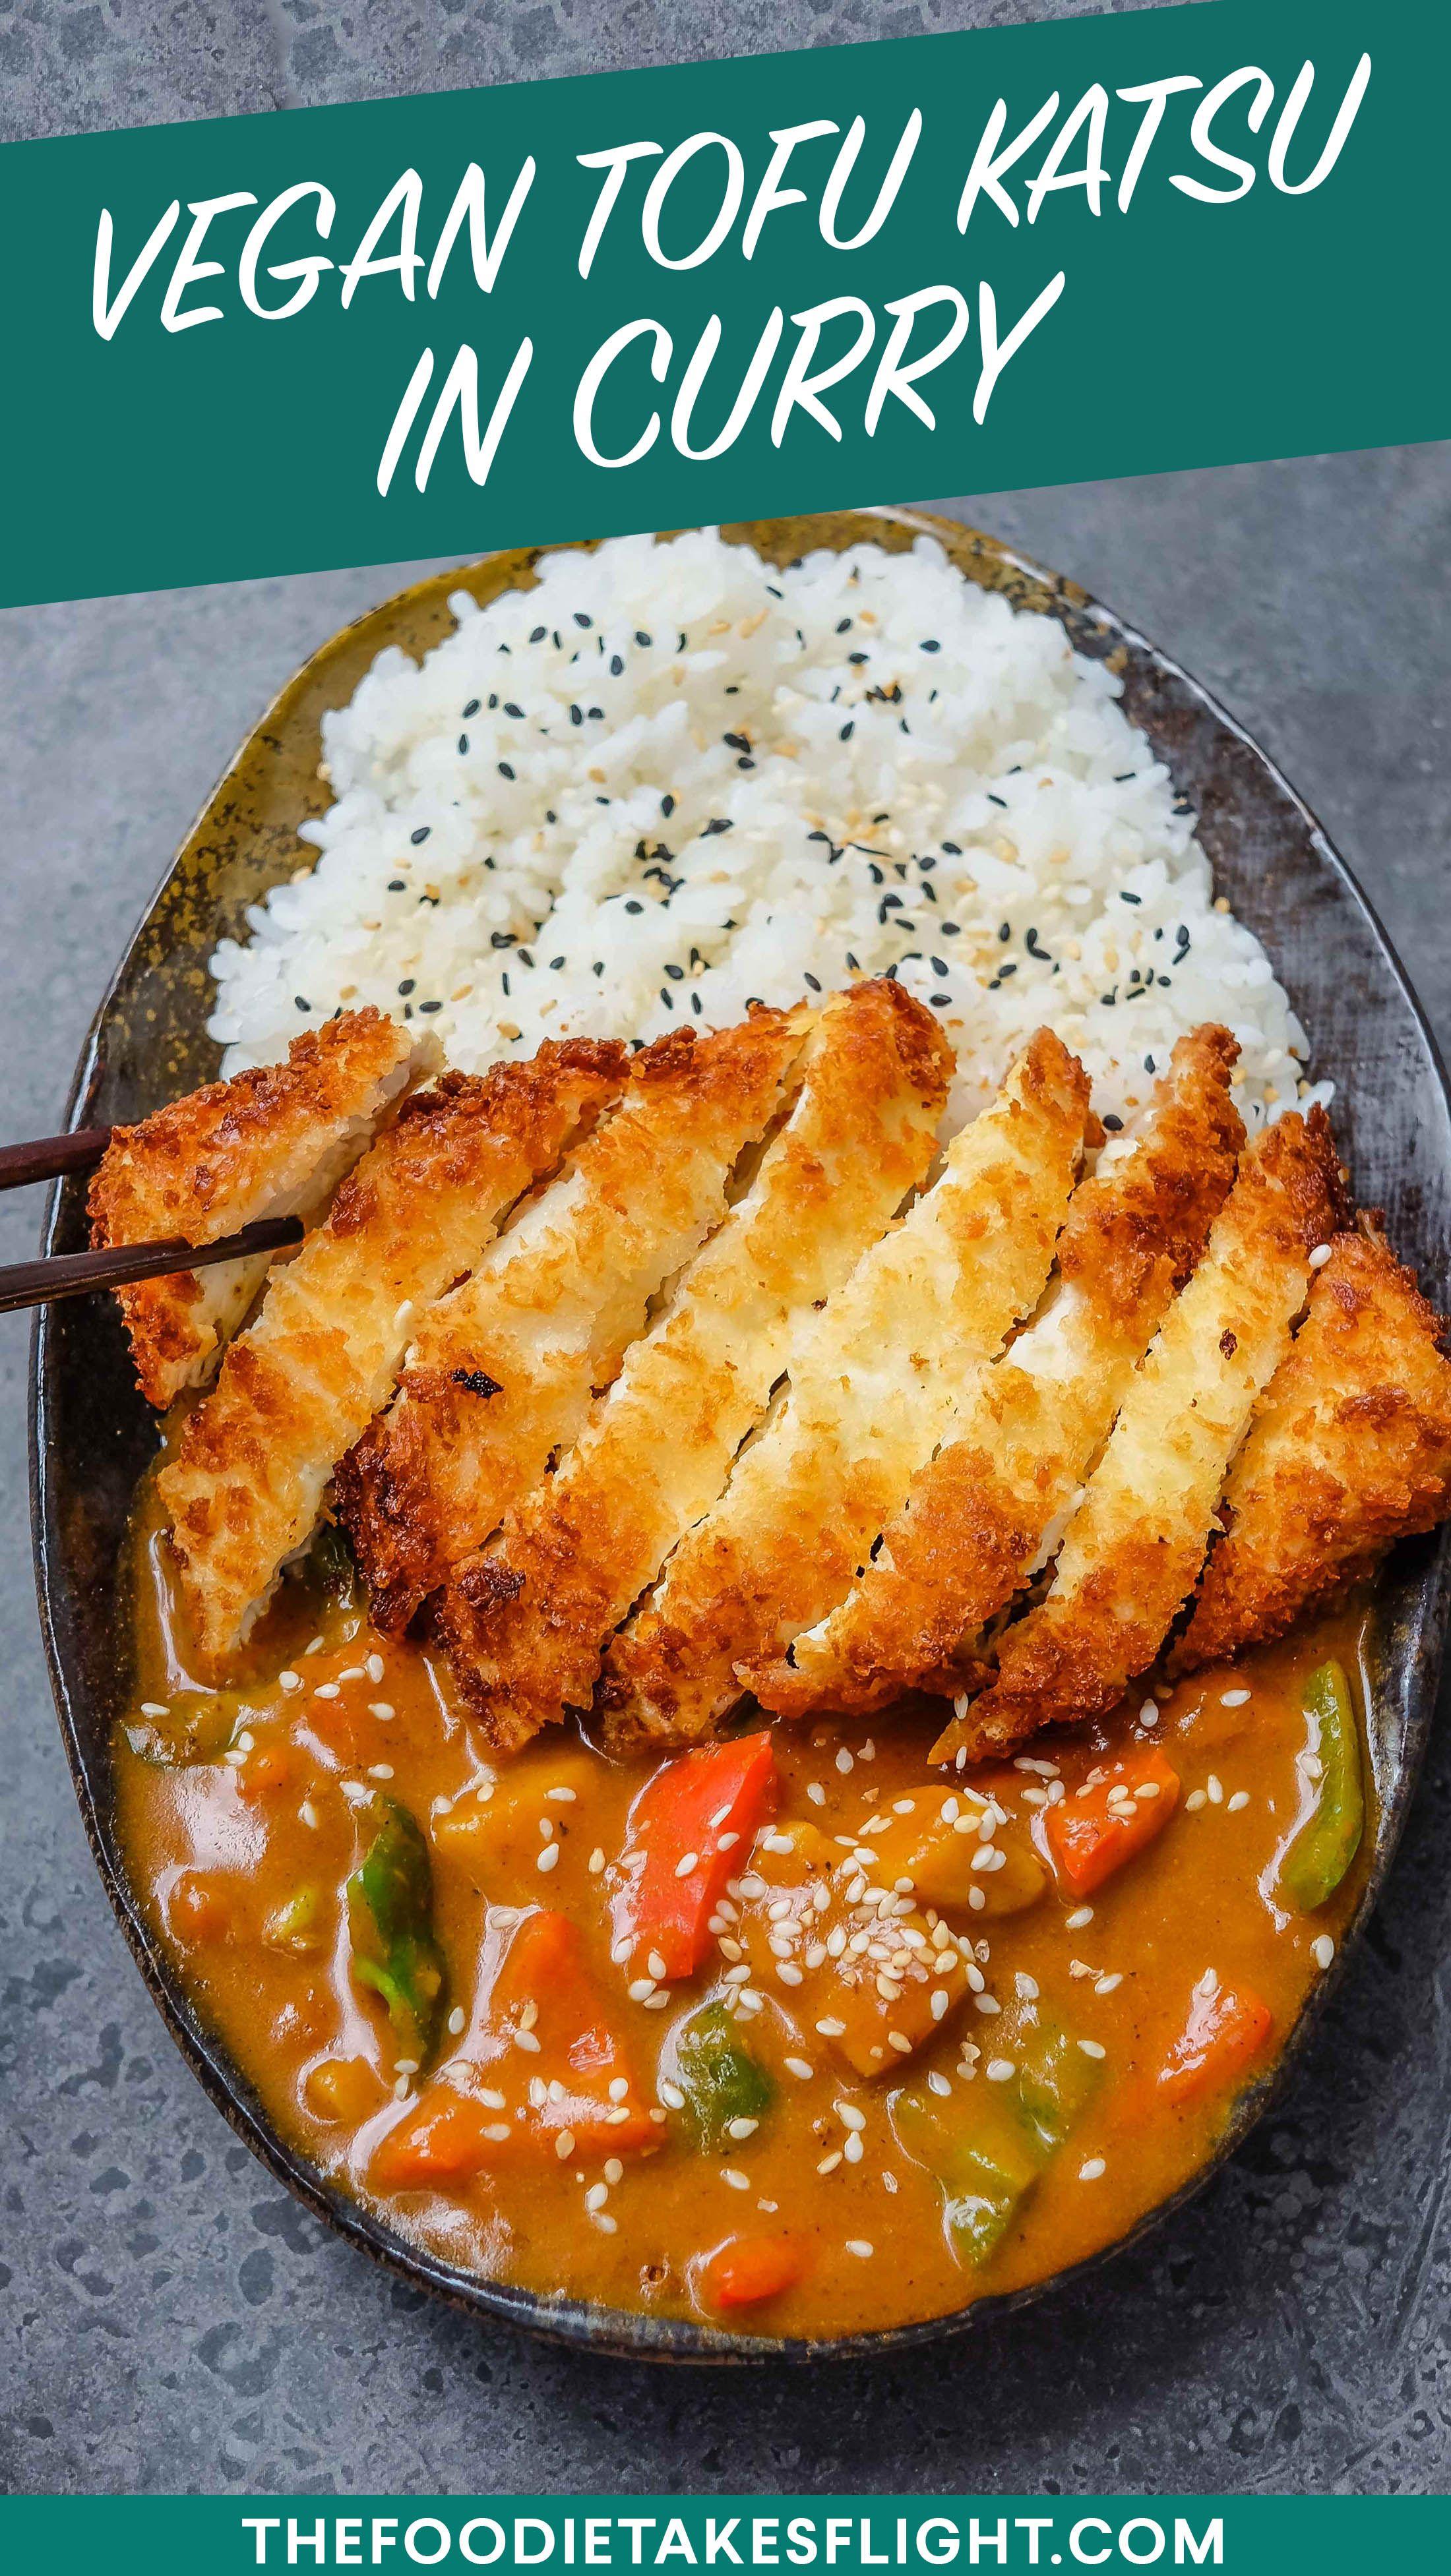 Japanese Tofu Katsu In Curry Vegan Recipe Tofu Recipes Vegan Tofu Recipes Healthy Vegetarian Recipes